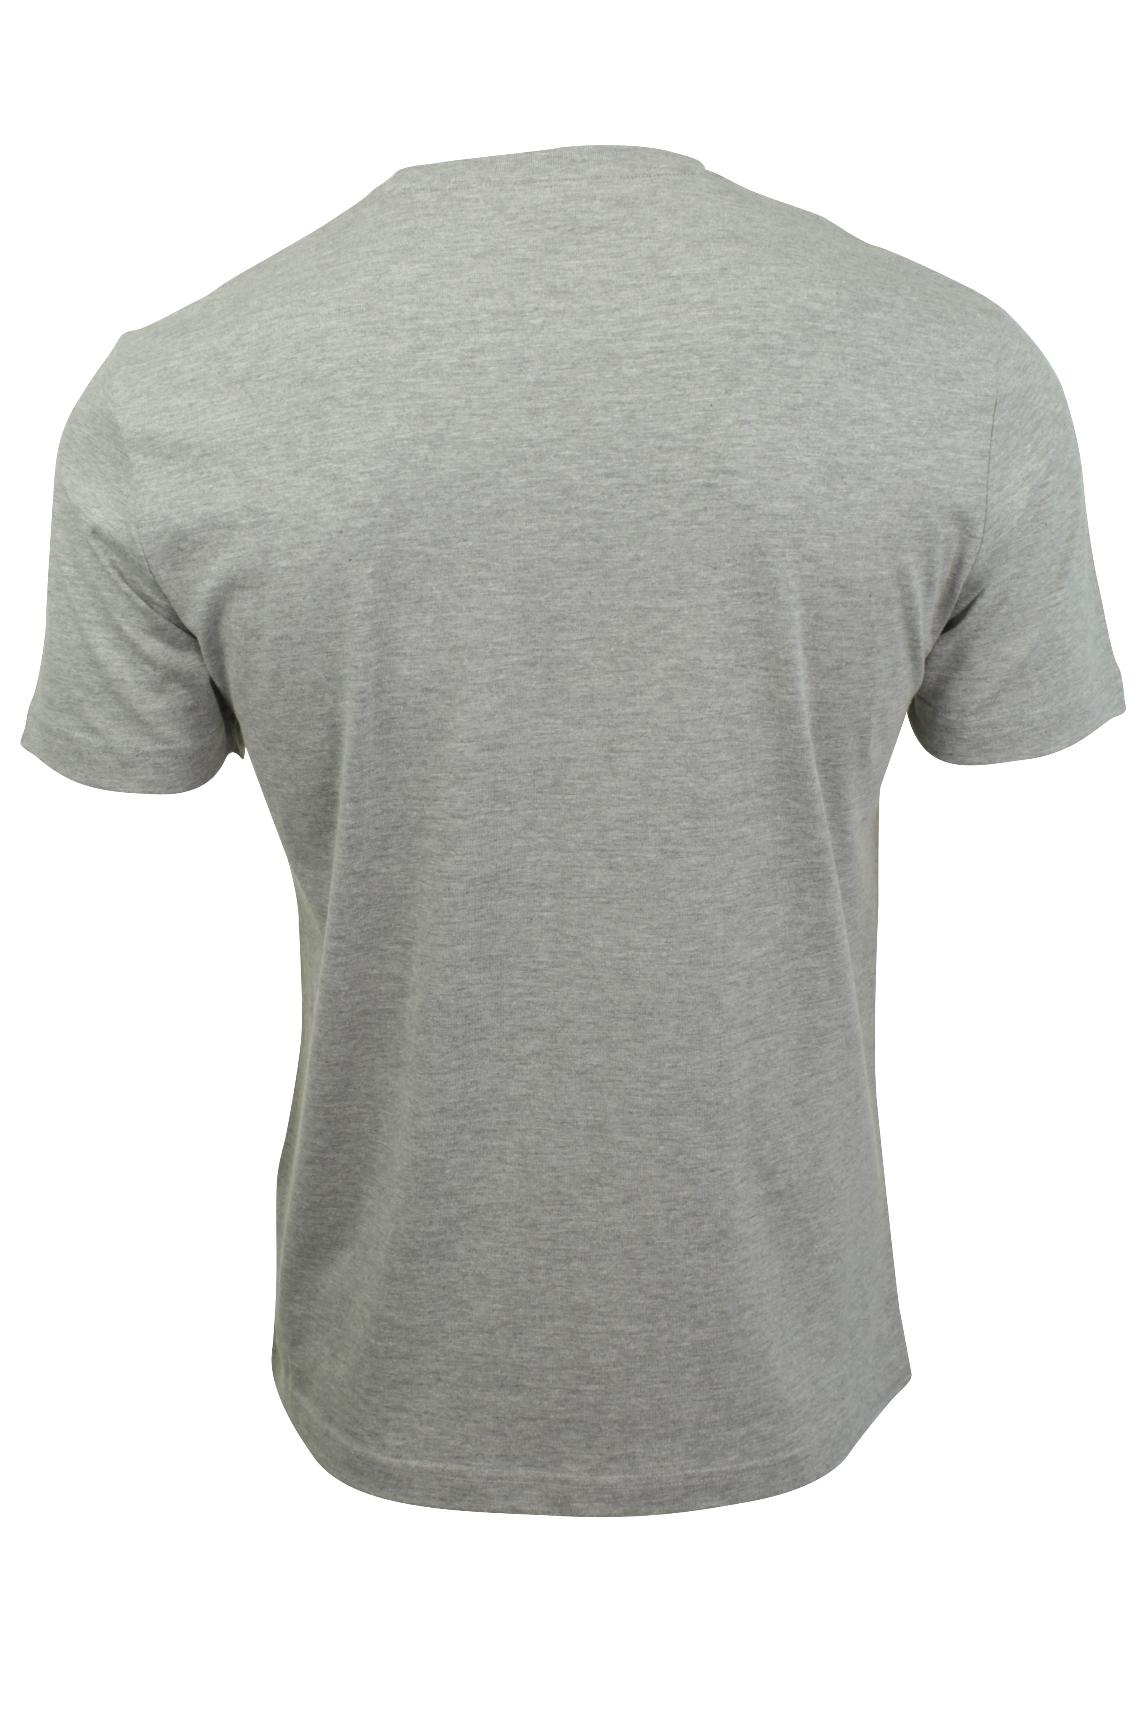 Mens-T-Shirt-by-Original-Penguin-Crew-Neck-Short-Sleeved thumbnail 38